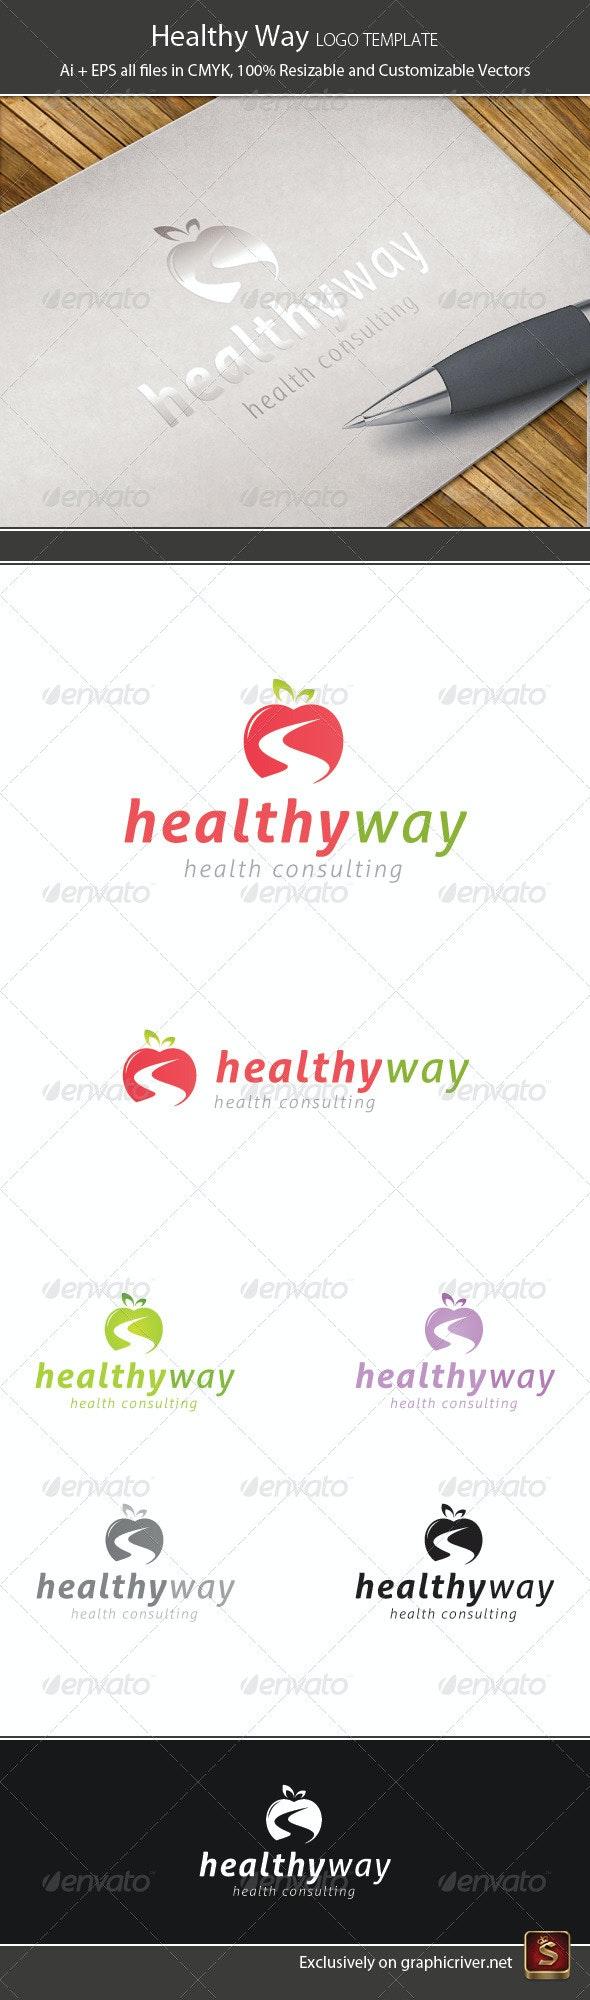 Healthy Way Logo Template - Vector Abstract